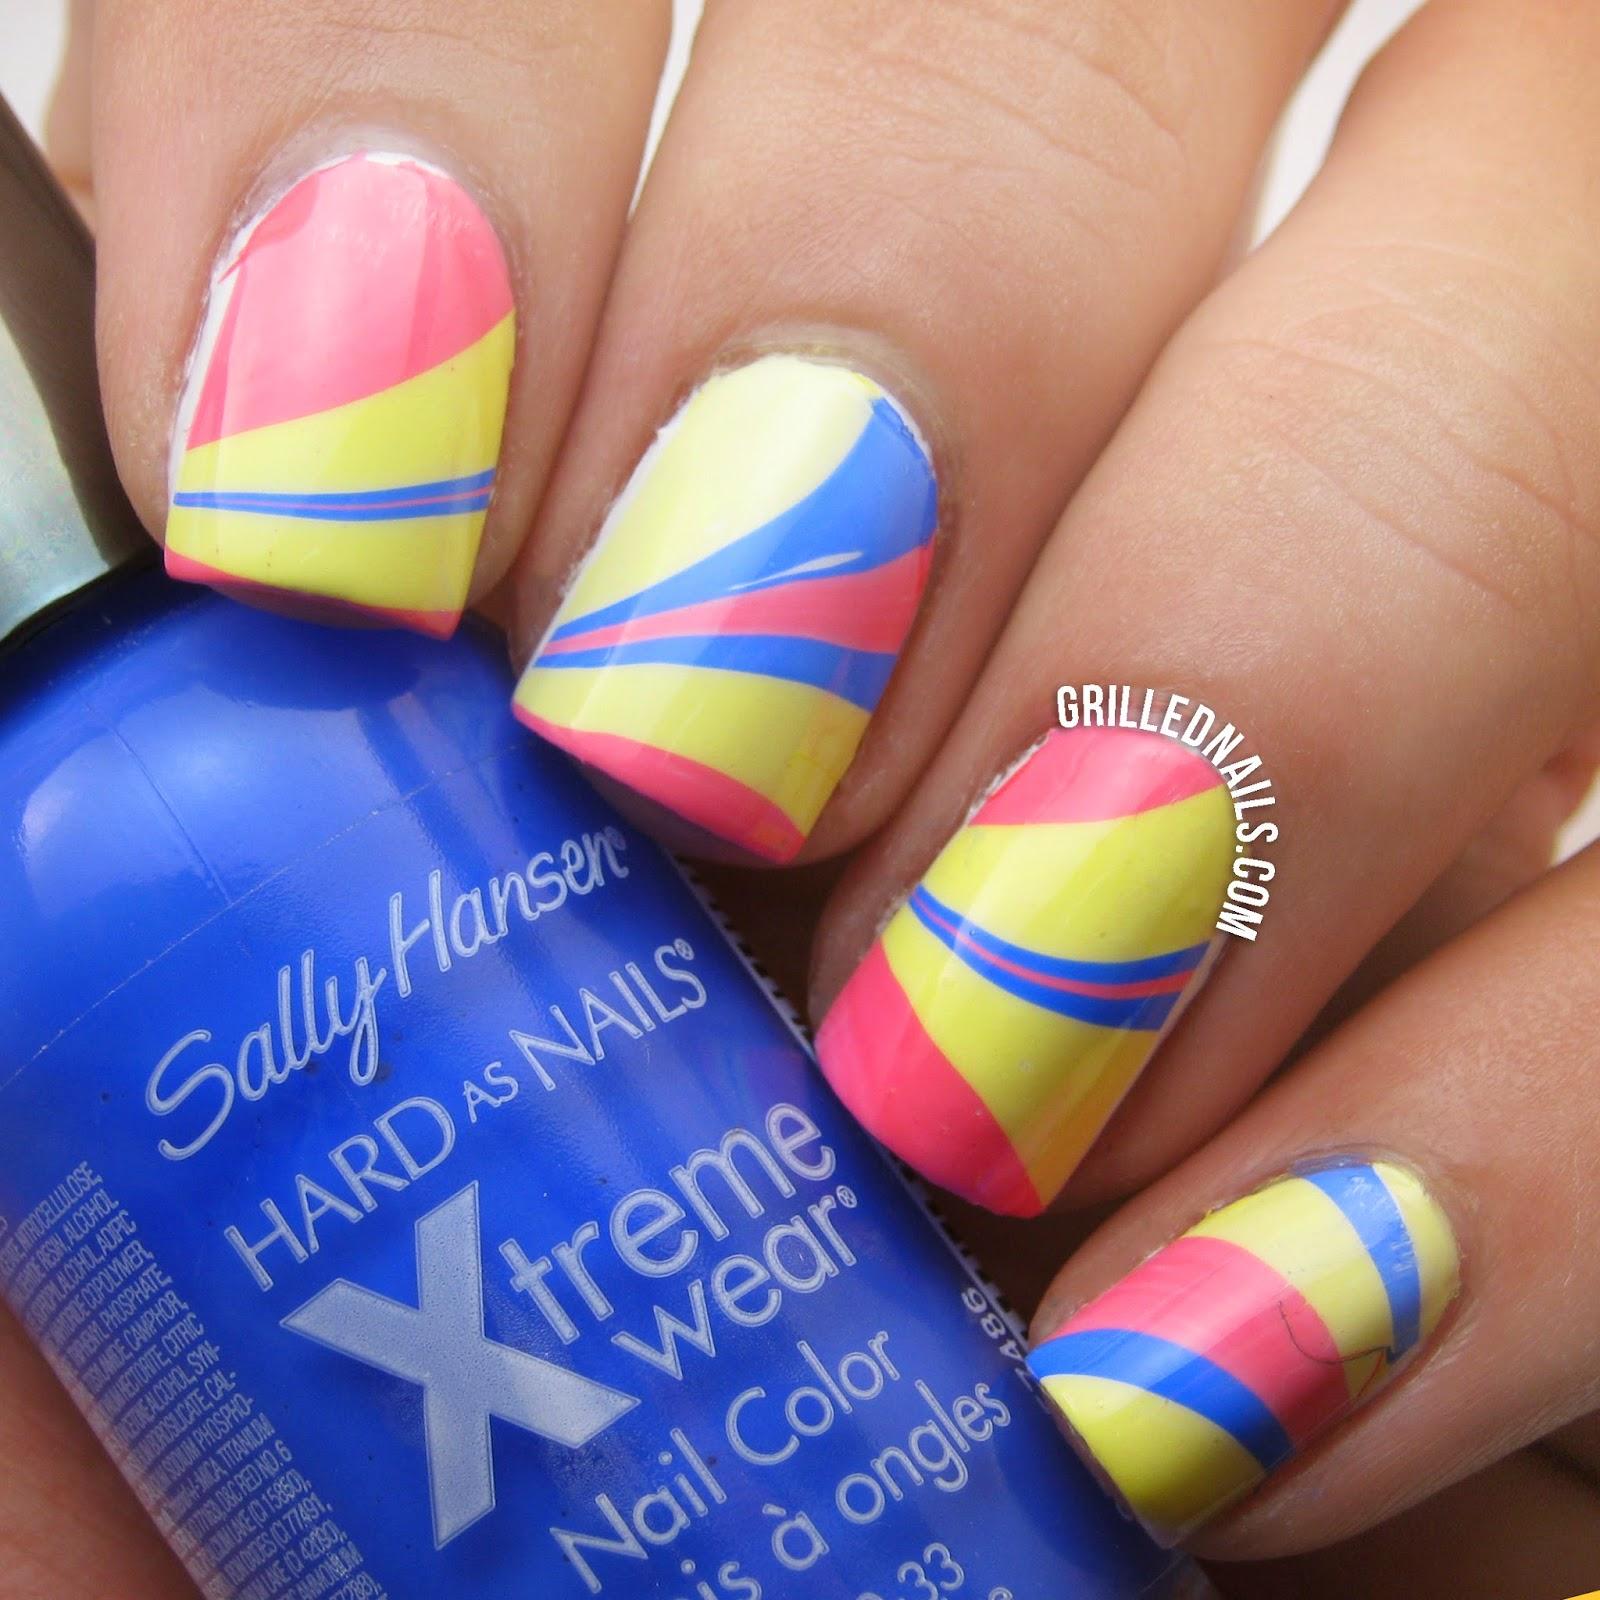 Nails Inc Marylebone Road